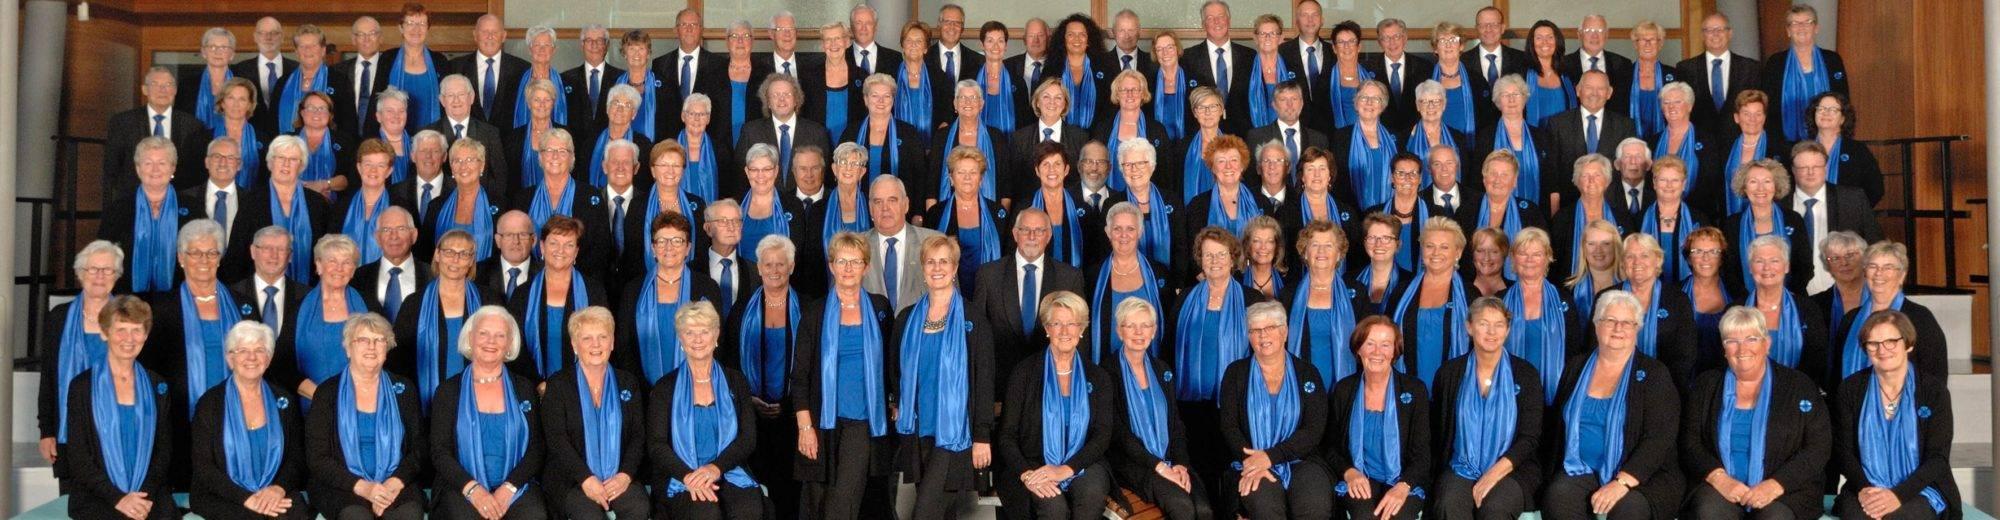 Westlandse Koorvereniging Musica